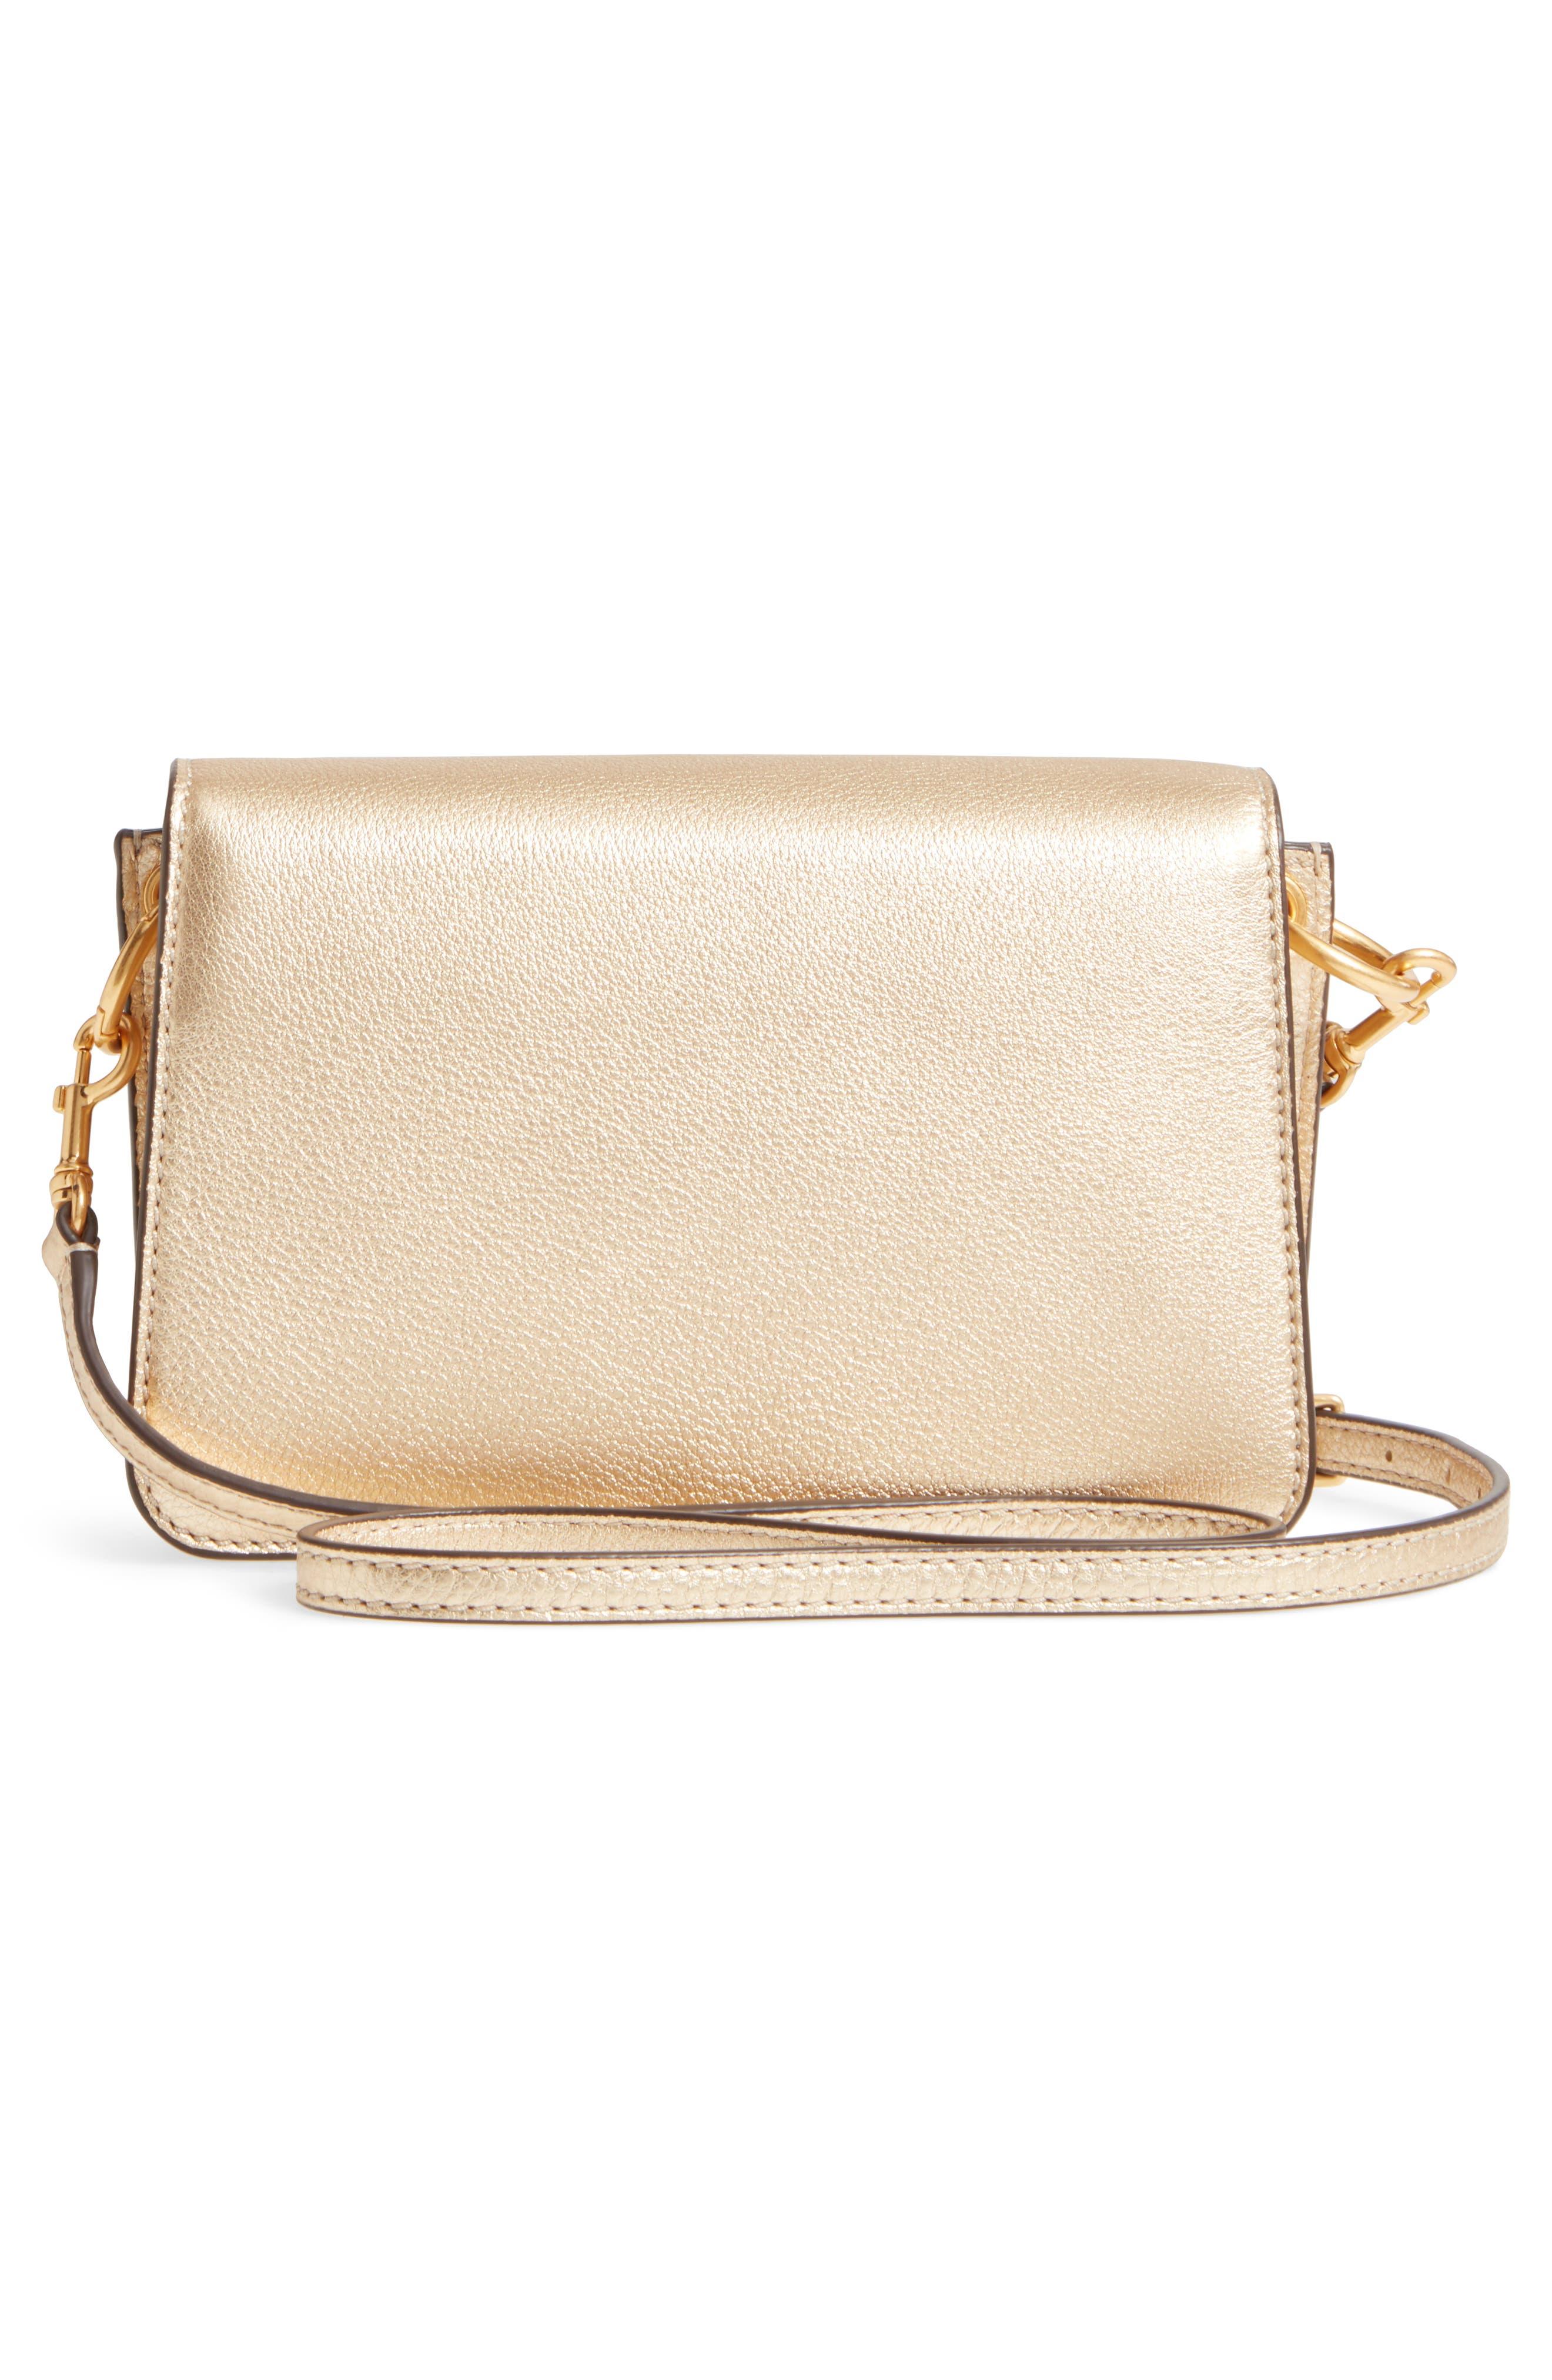 McGraw Metallic Leather Shoulder Bag,                             Alternate thumbnail 3, color,